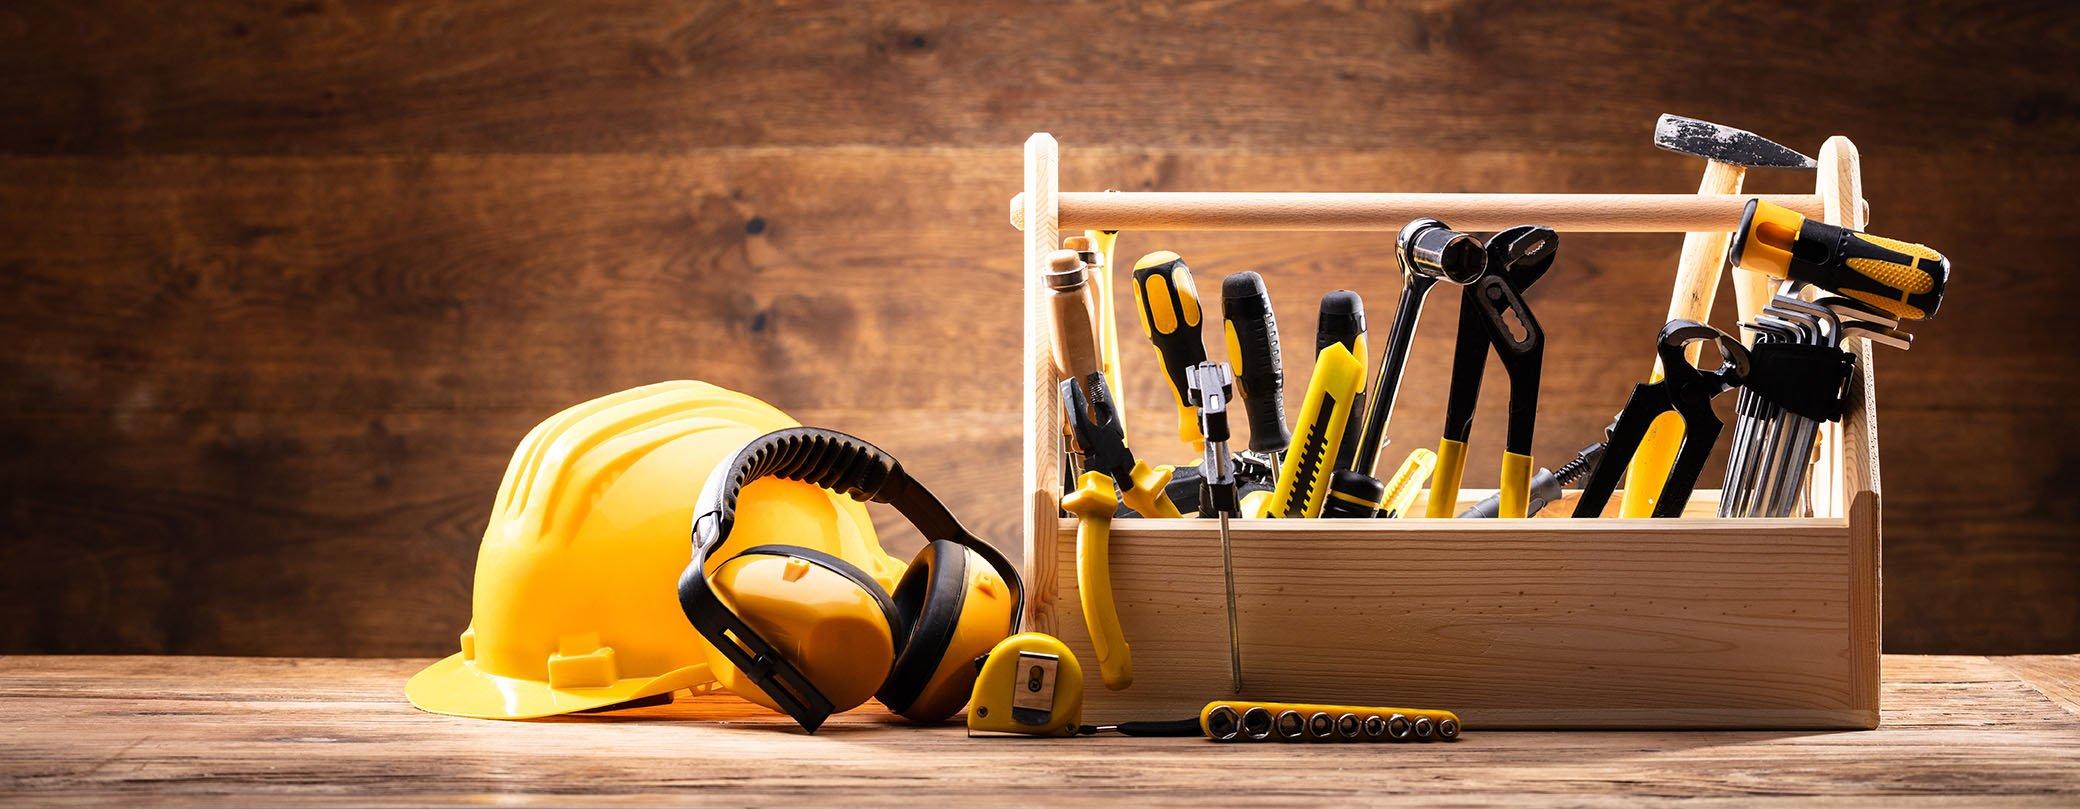 Handyman Insurance in New Hampshire  HPM Insurance